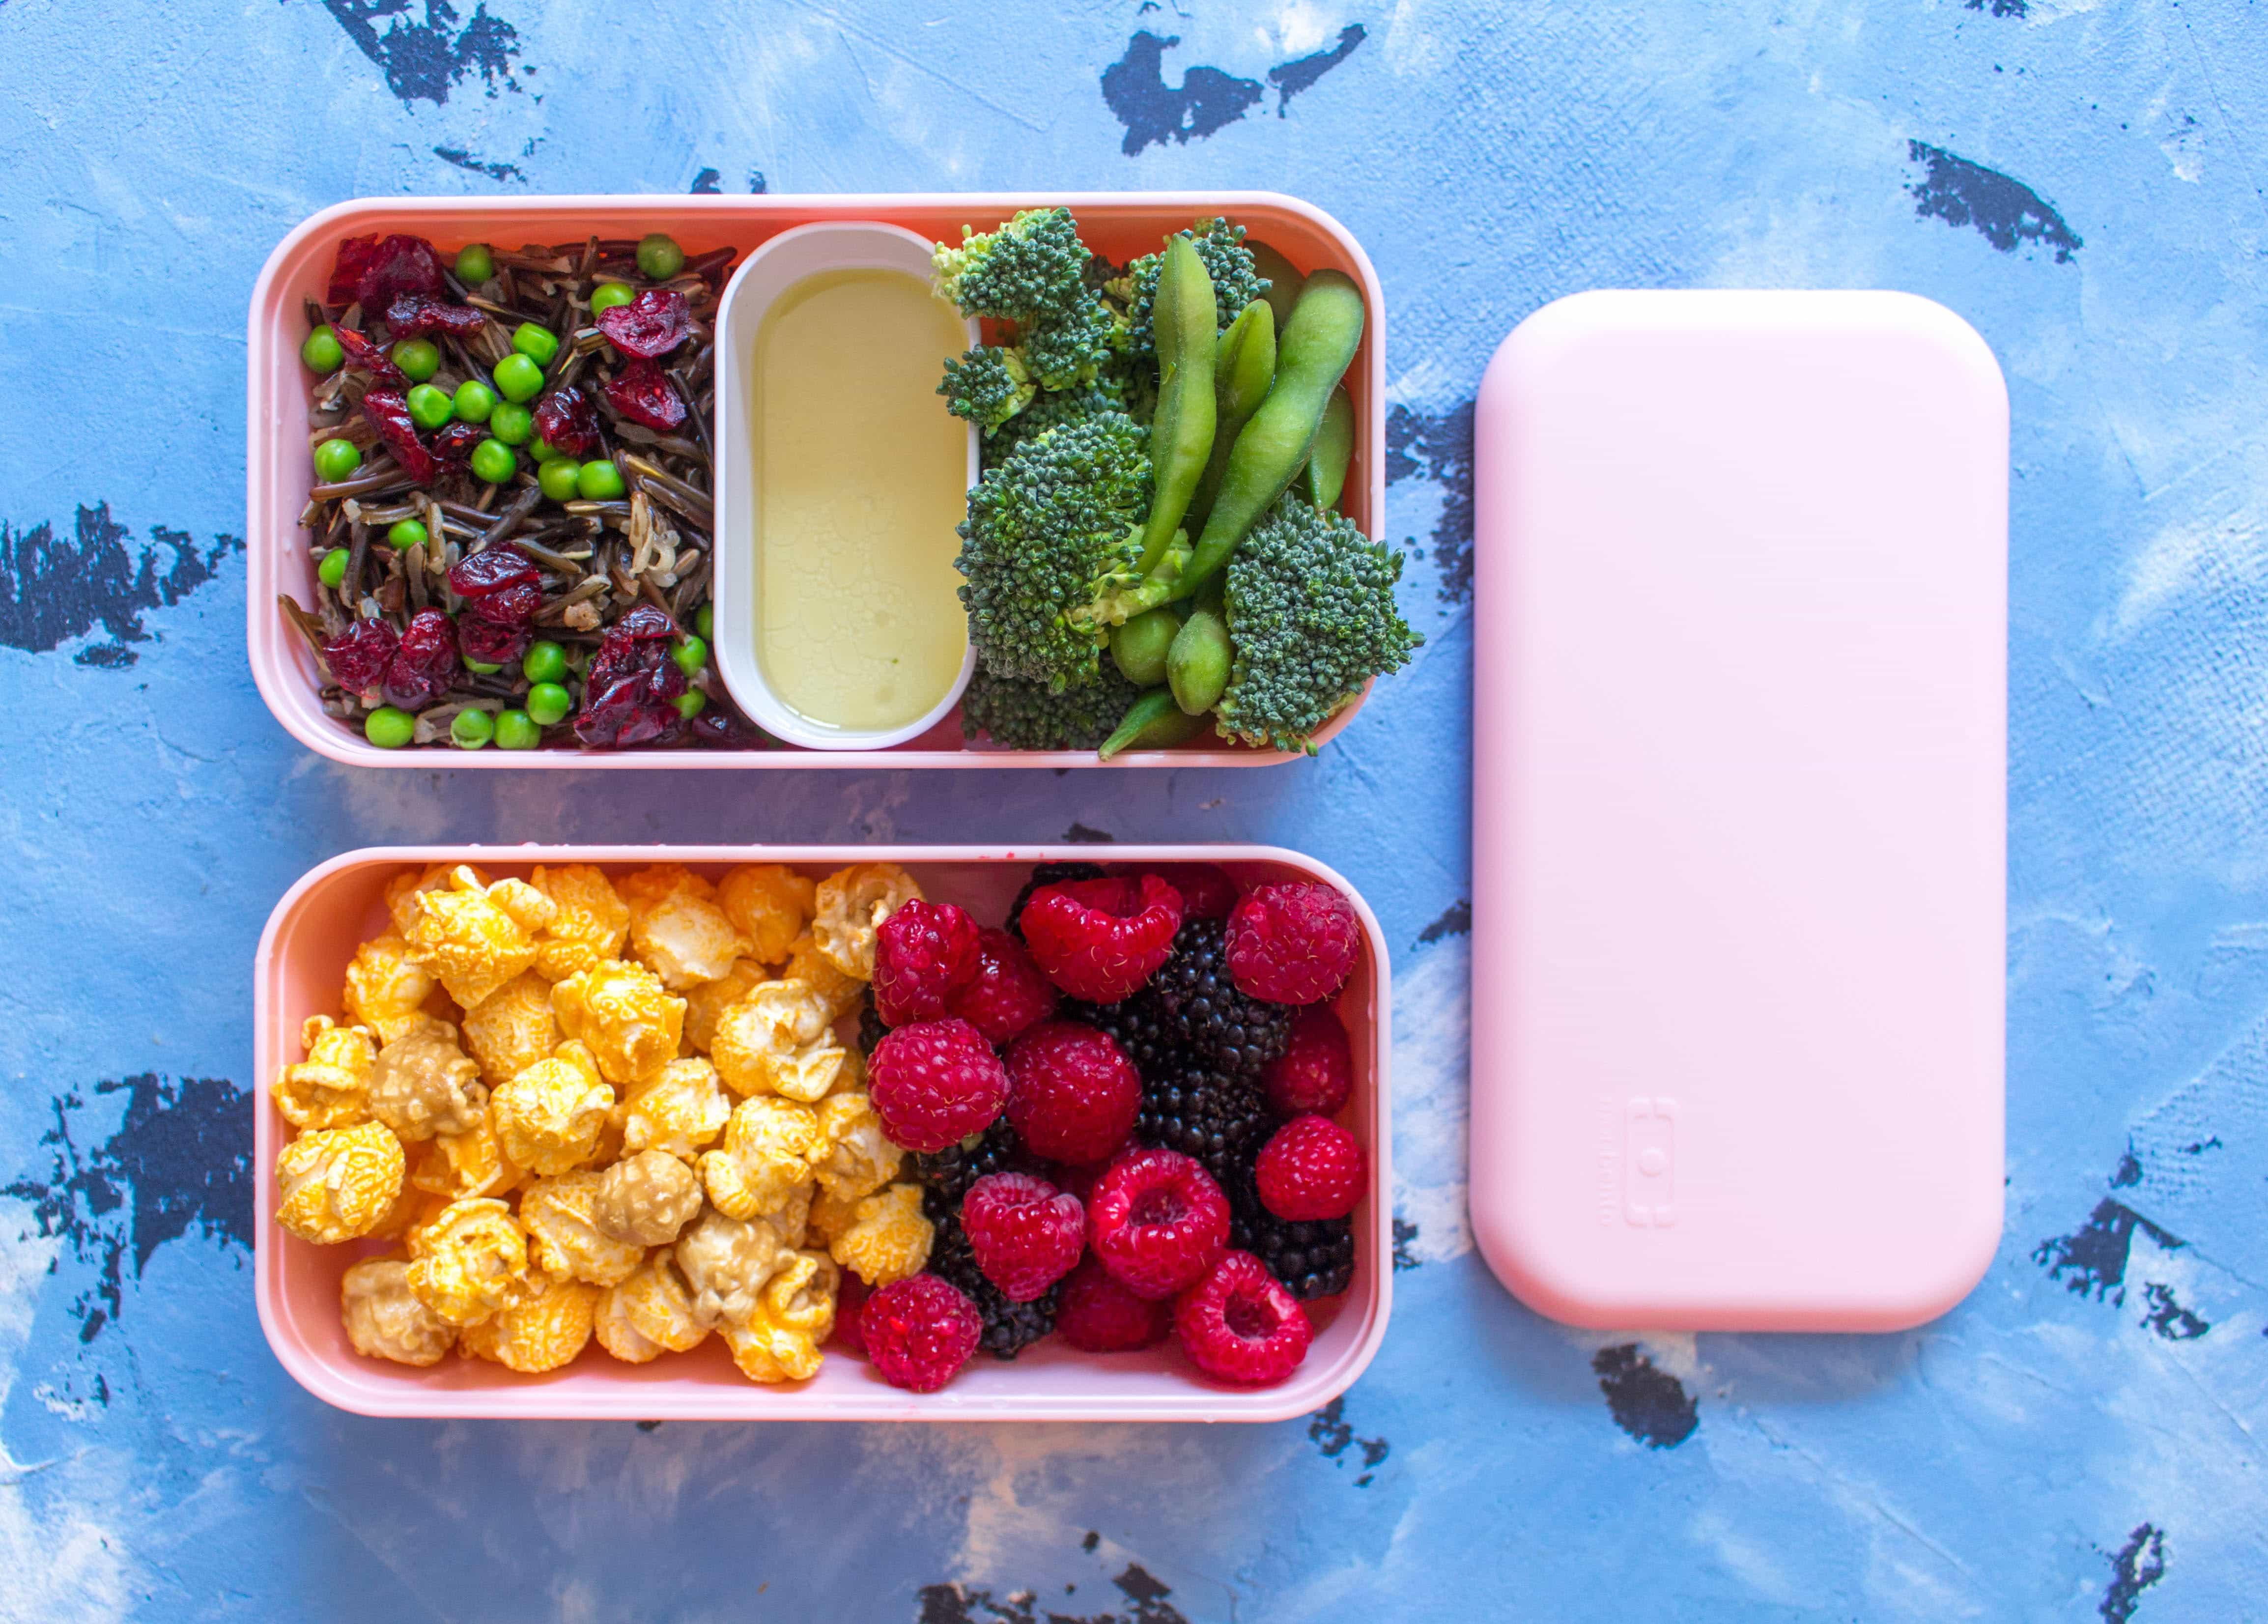 Bento Box Lunch Wild Rice Salad With Fruit Carmy Run